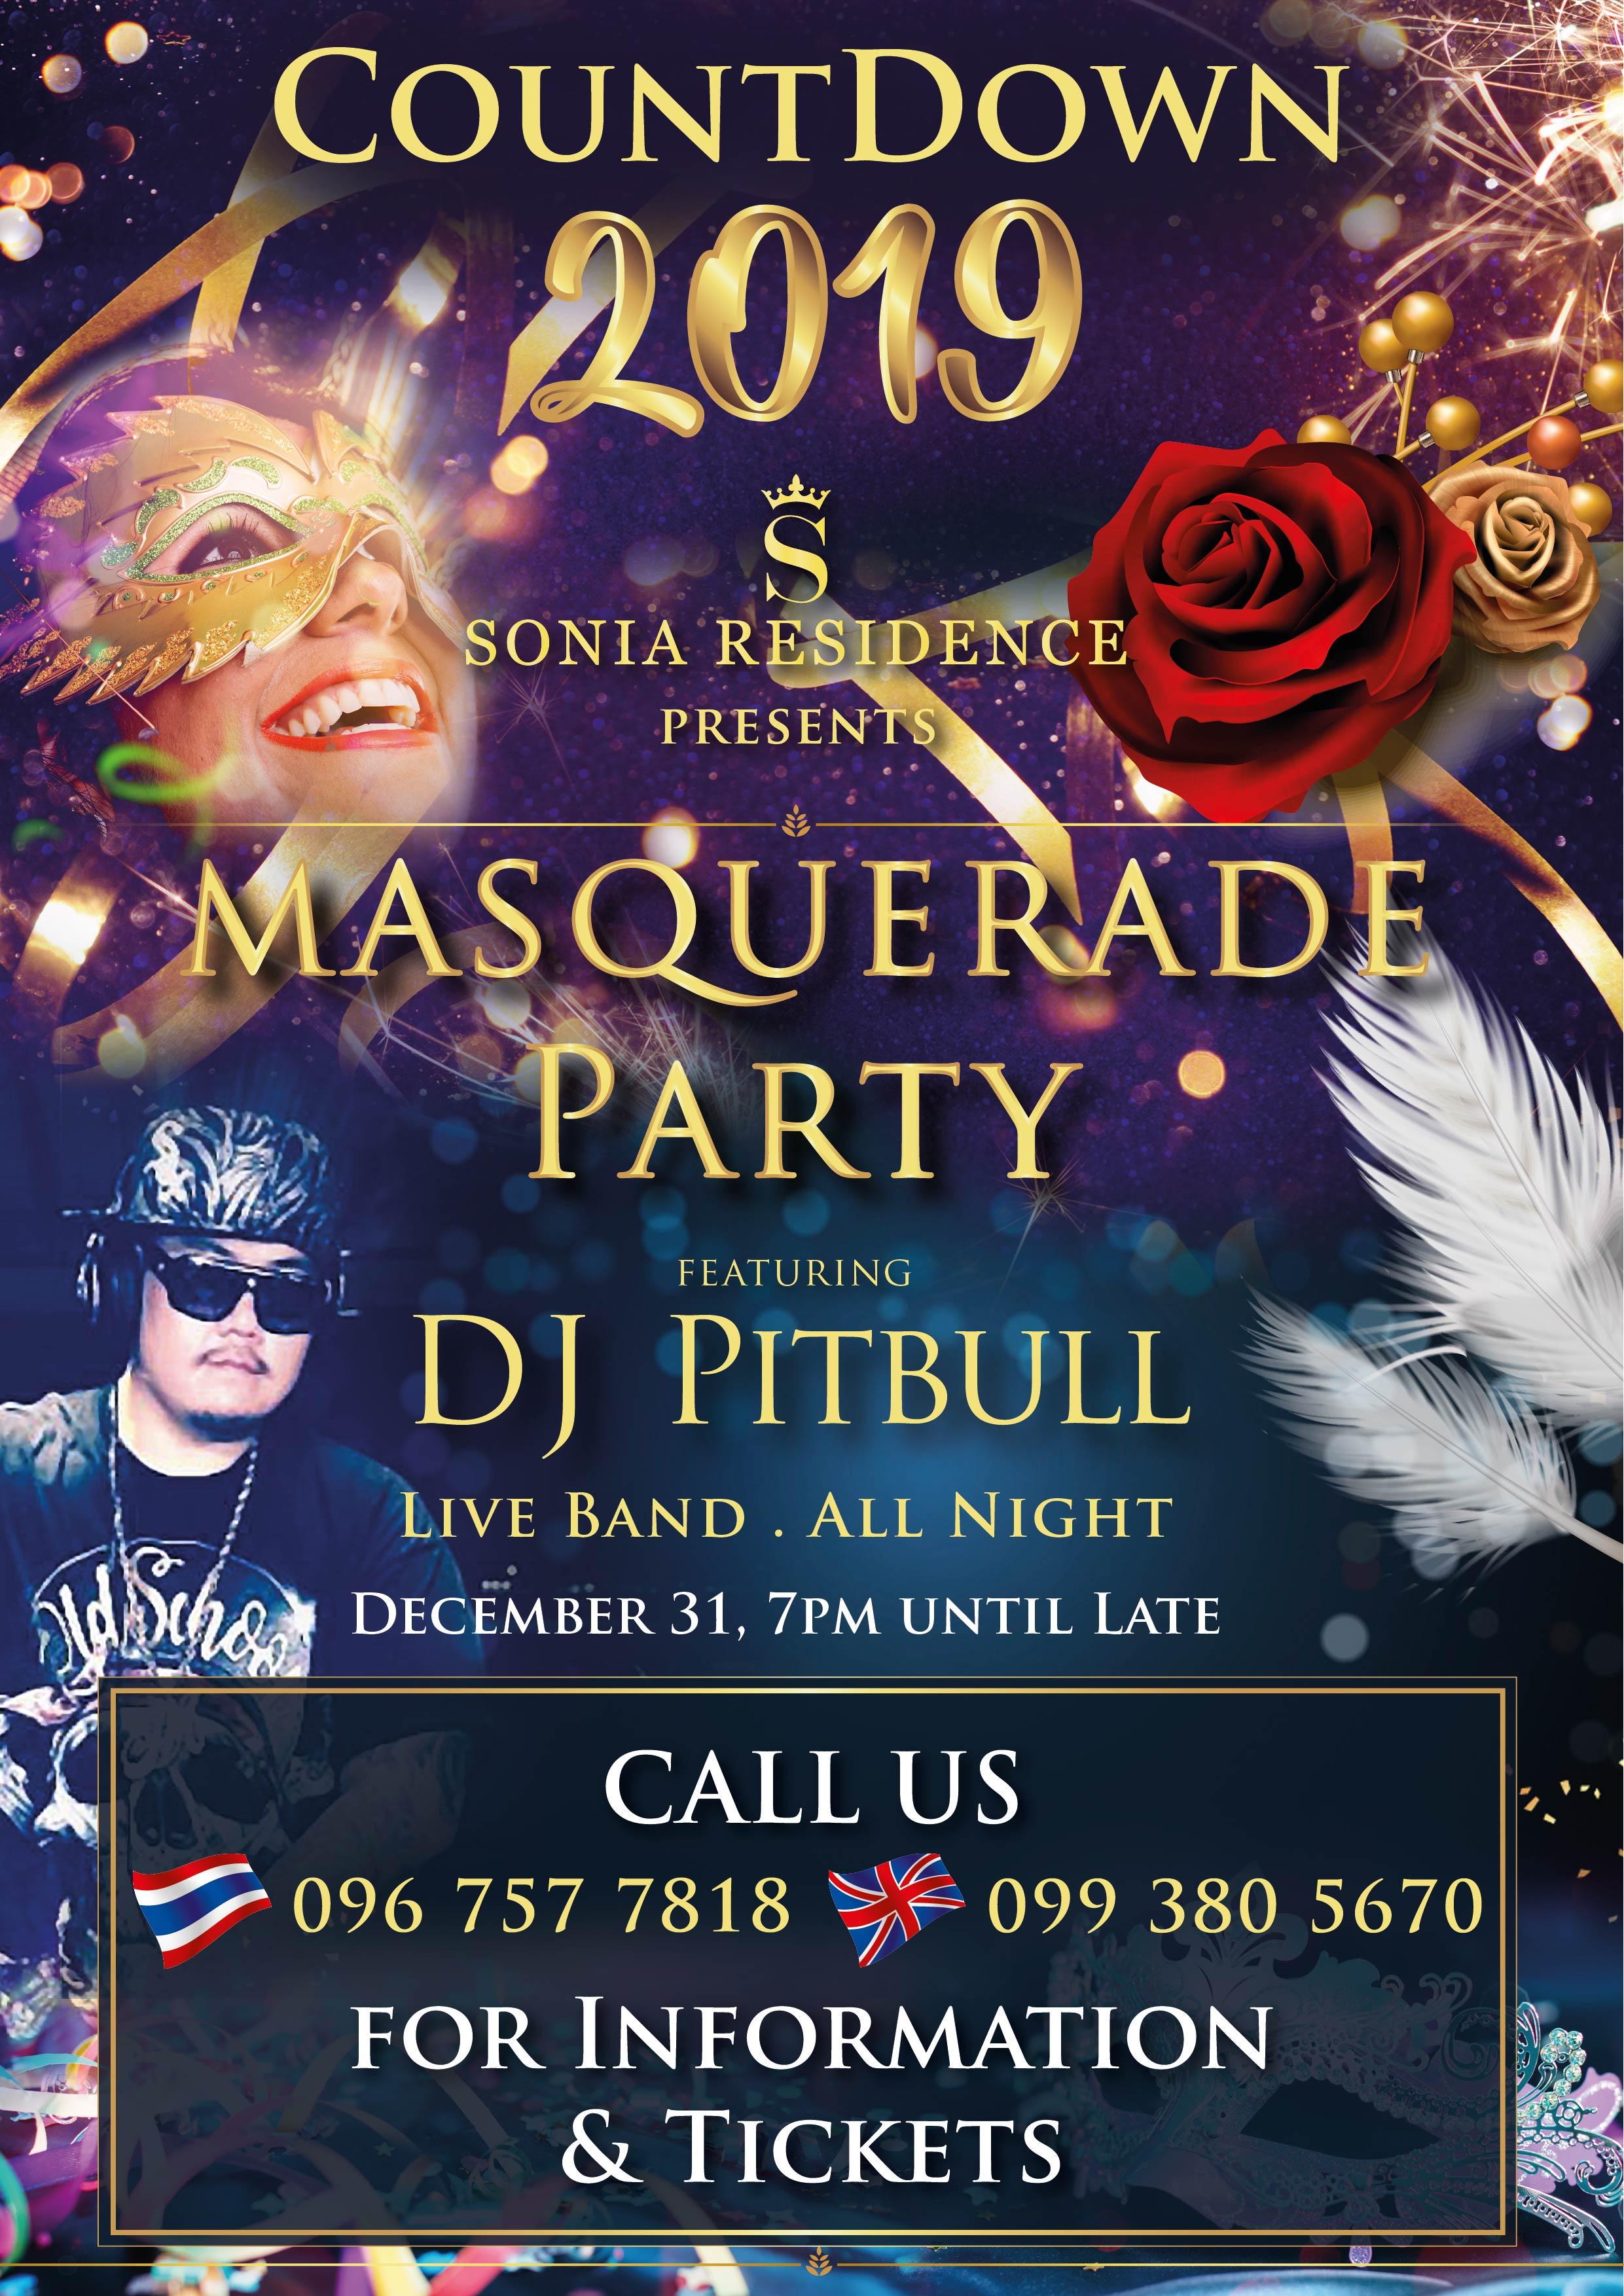 12-09-2018 Countdown La Carnival final NEW-051